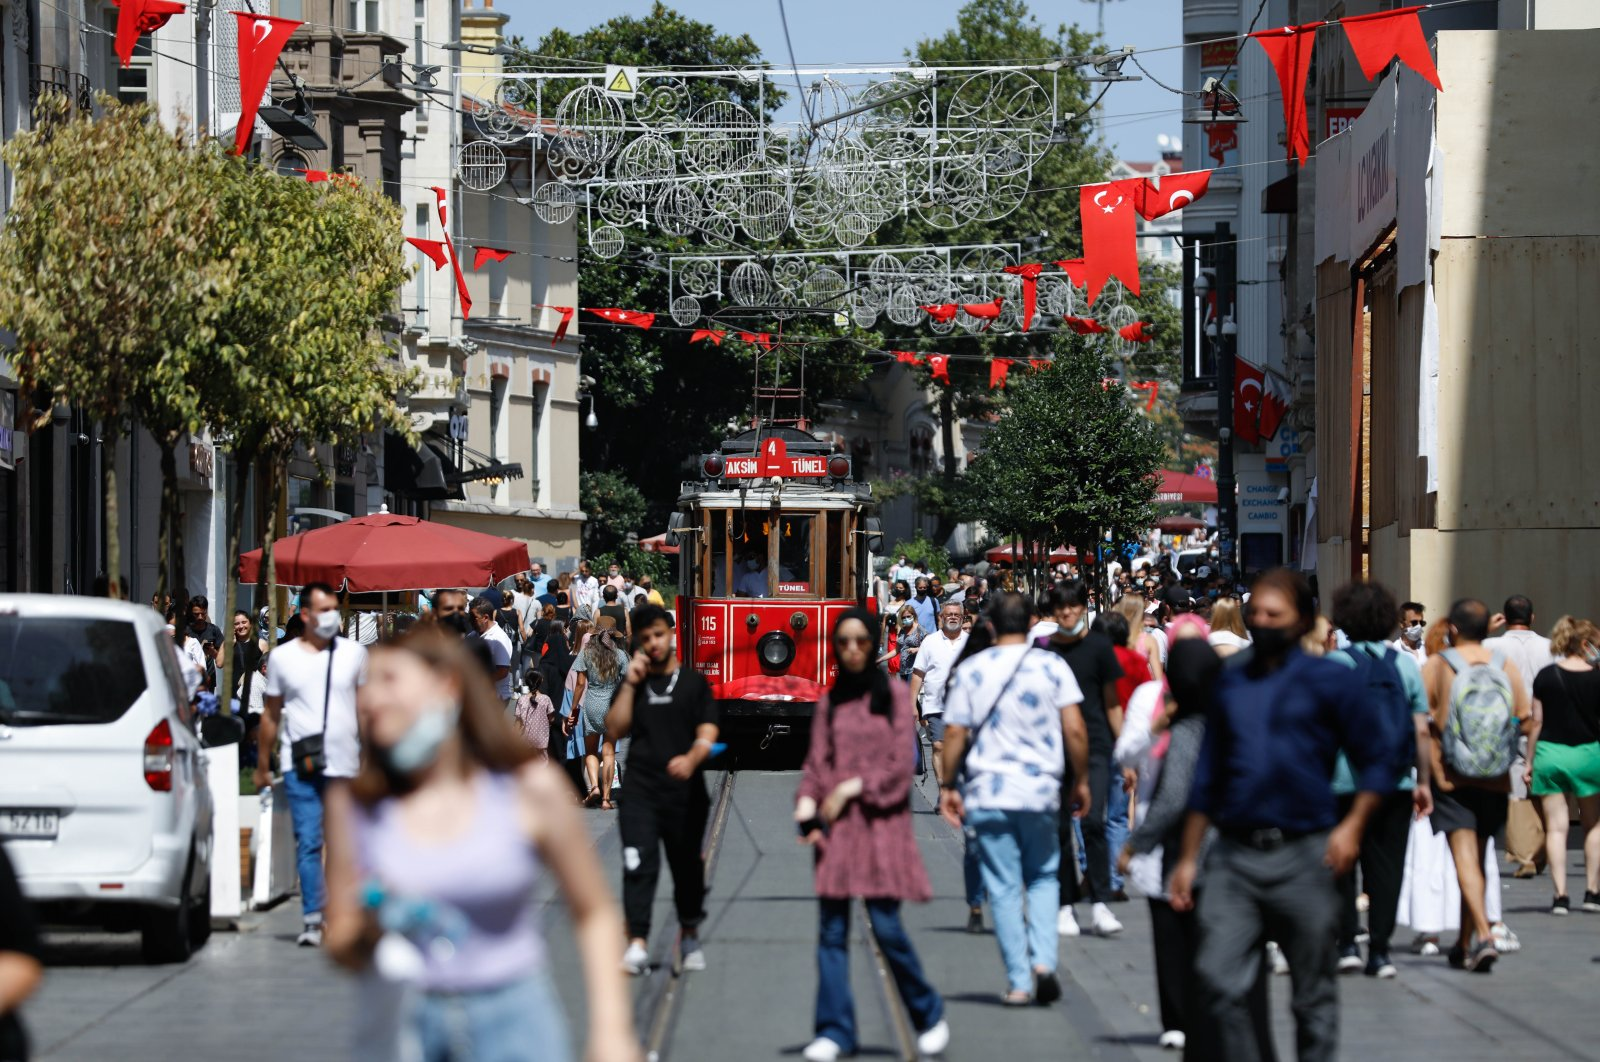 People with masks walk on Istiklal Street, Istanbul, Turkey, July 30, 2021. (DHA Photo)